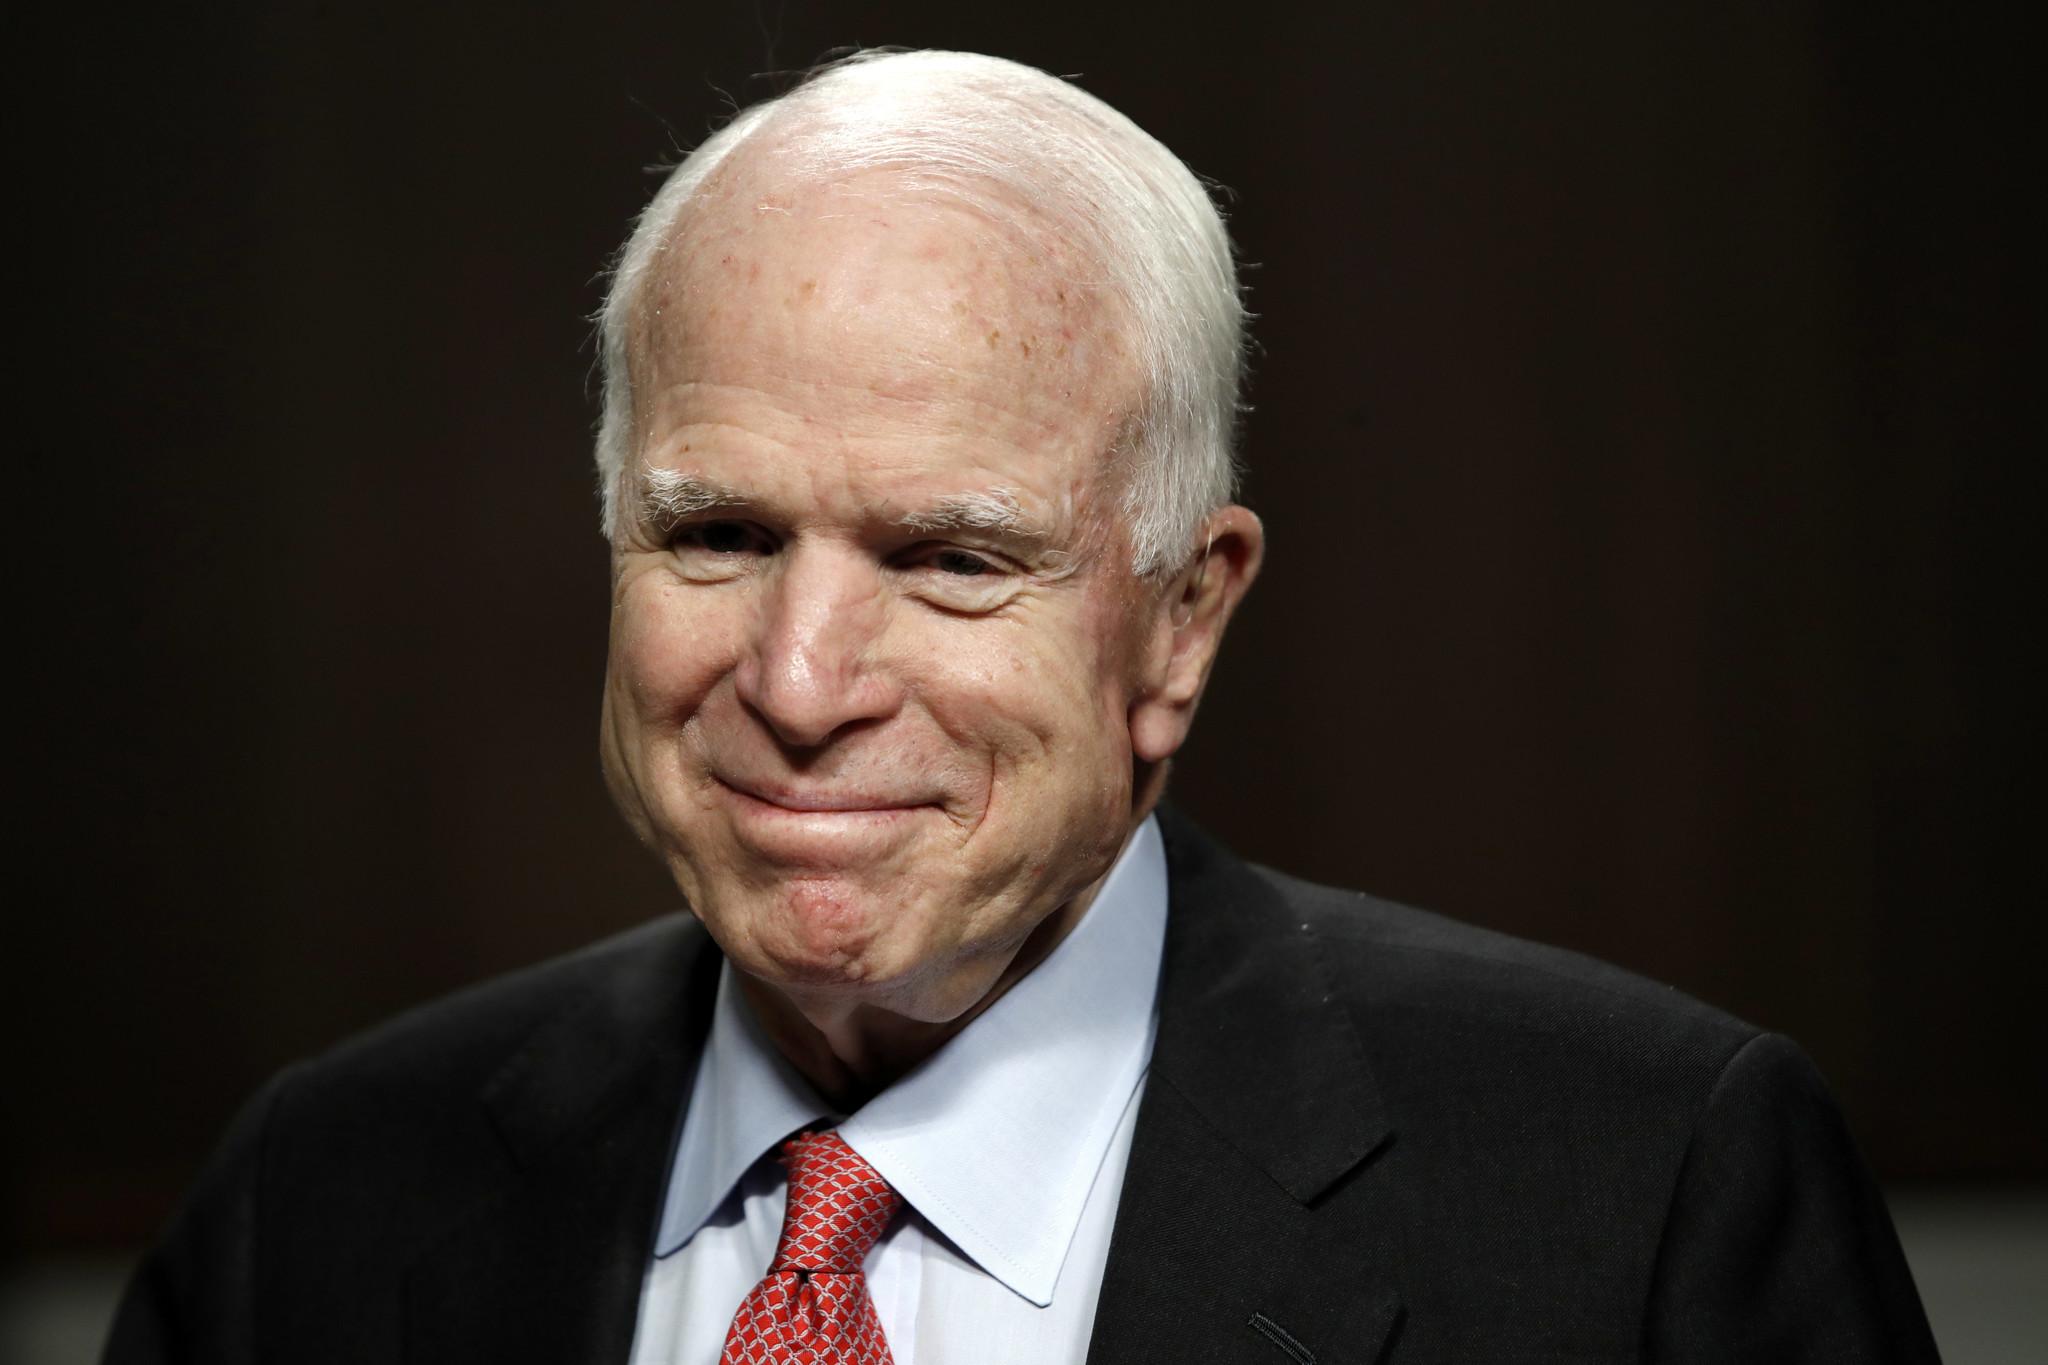 Sen. John McCain. (Jacquelyn Martin / Associated Press)